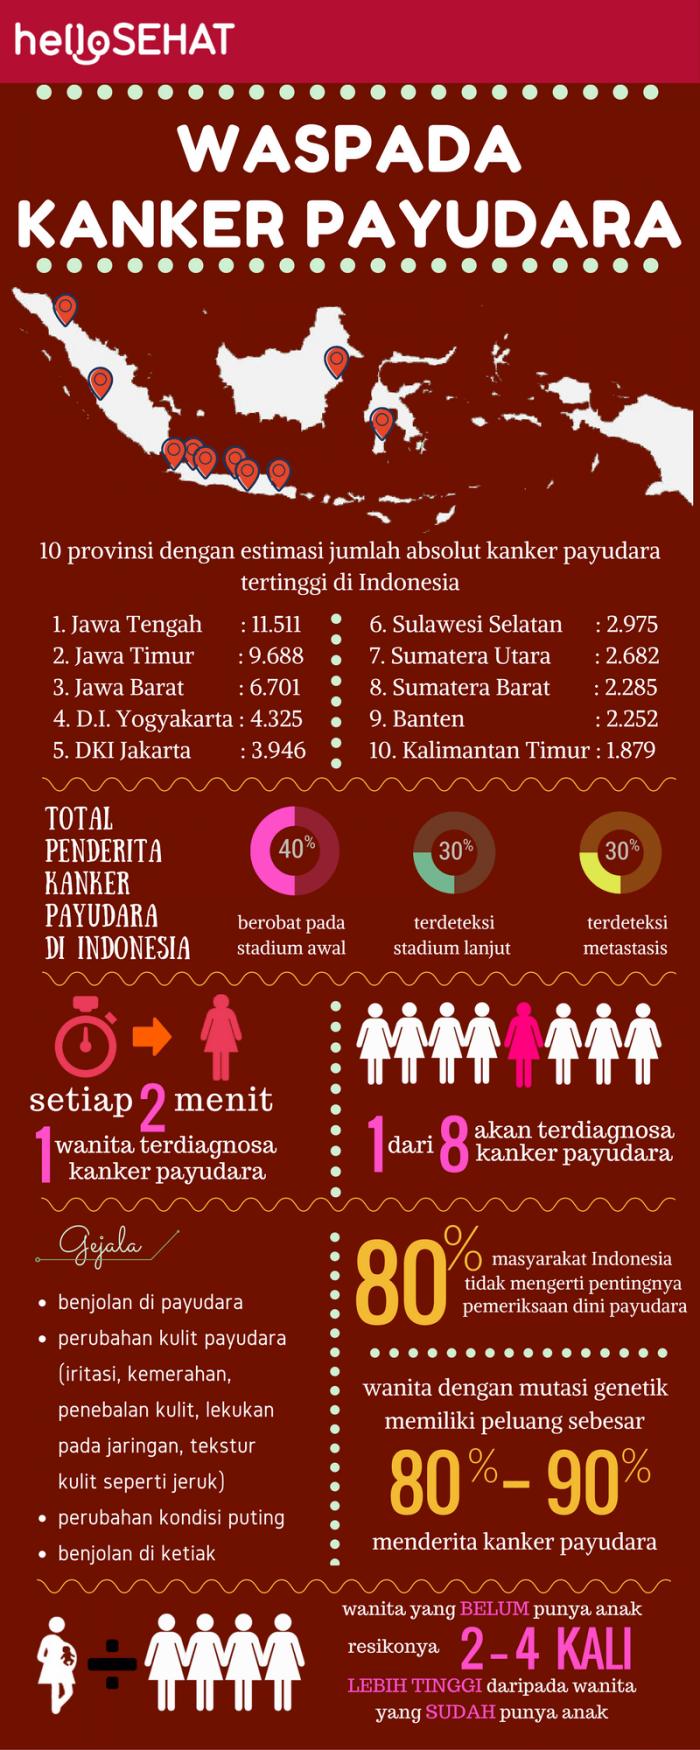 Infografik: Kanker Payudara di Indonesia - Breast Friends ...